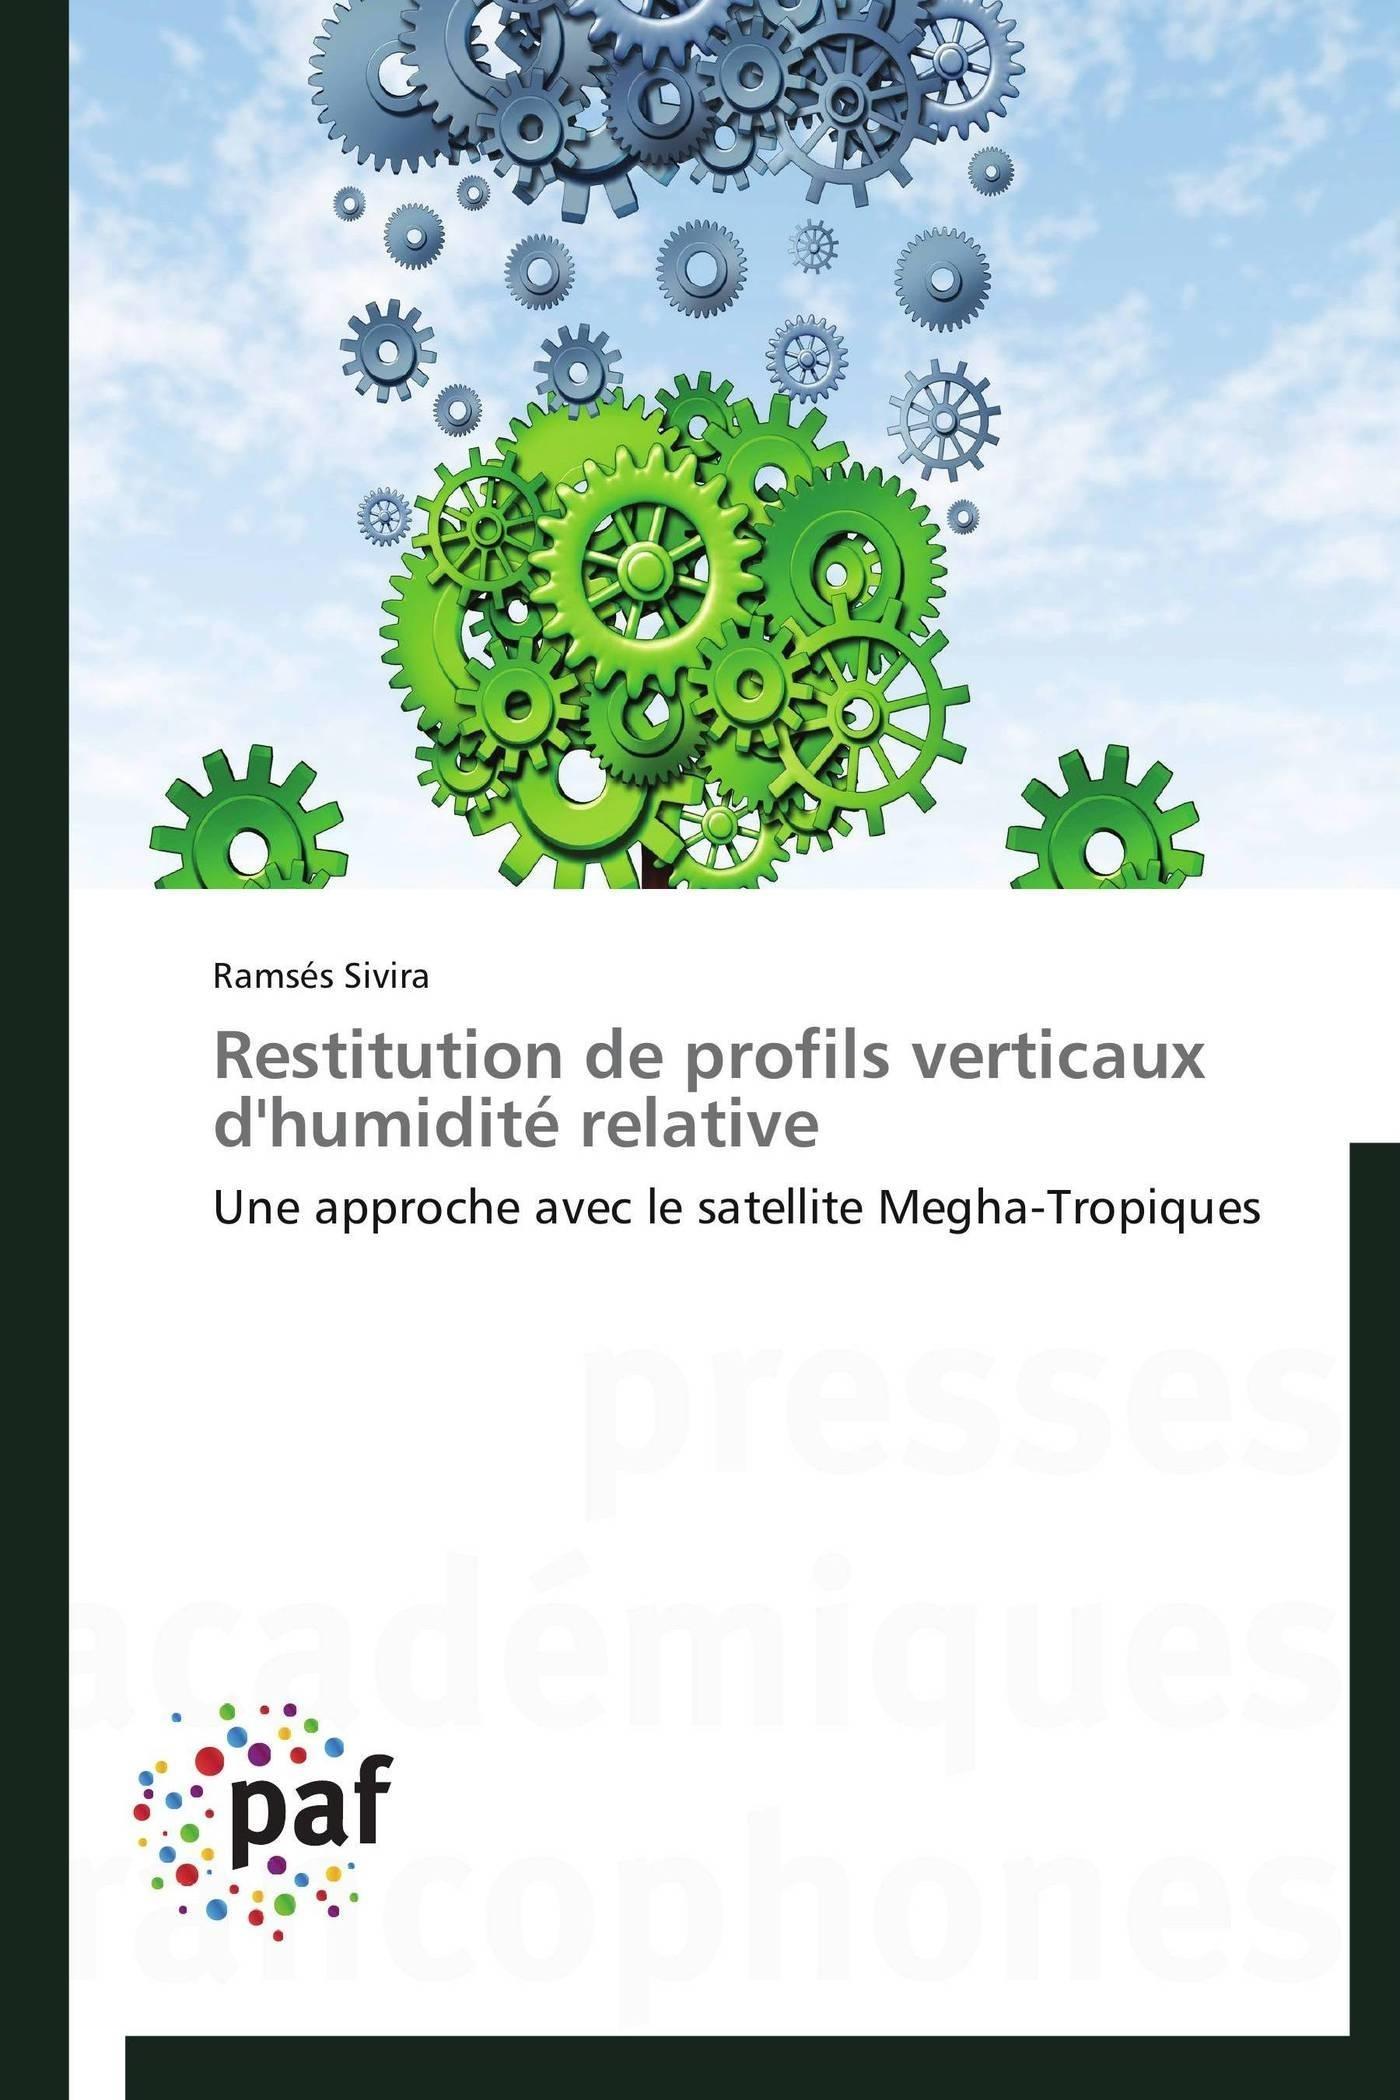 RESTITUTION DE PROFILS VERTICAUX D'HUMIDITE RELATIVE